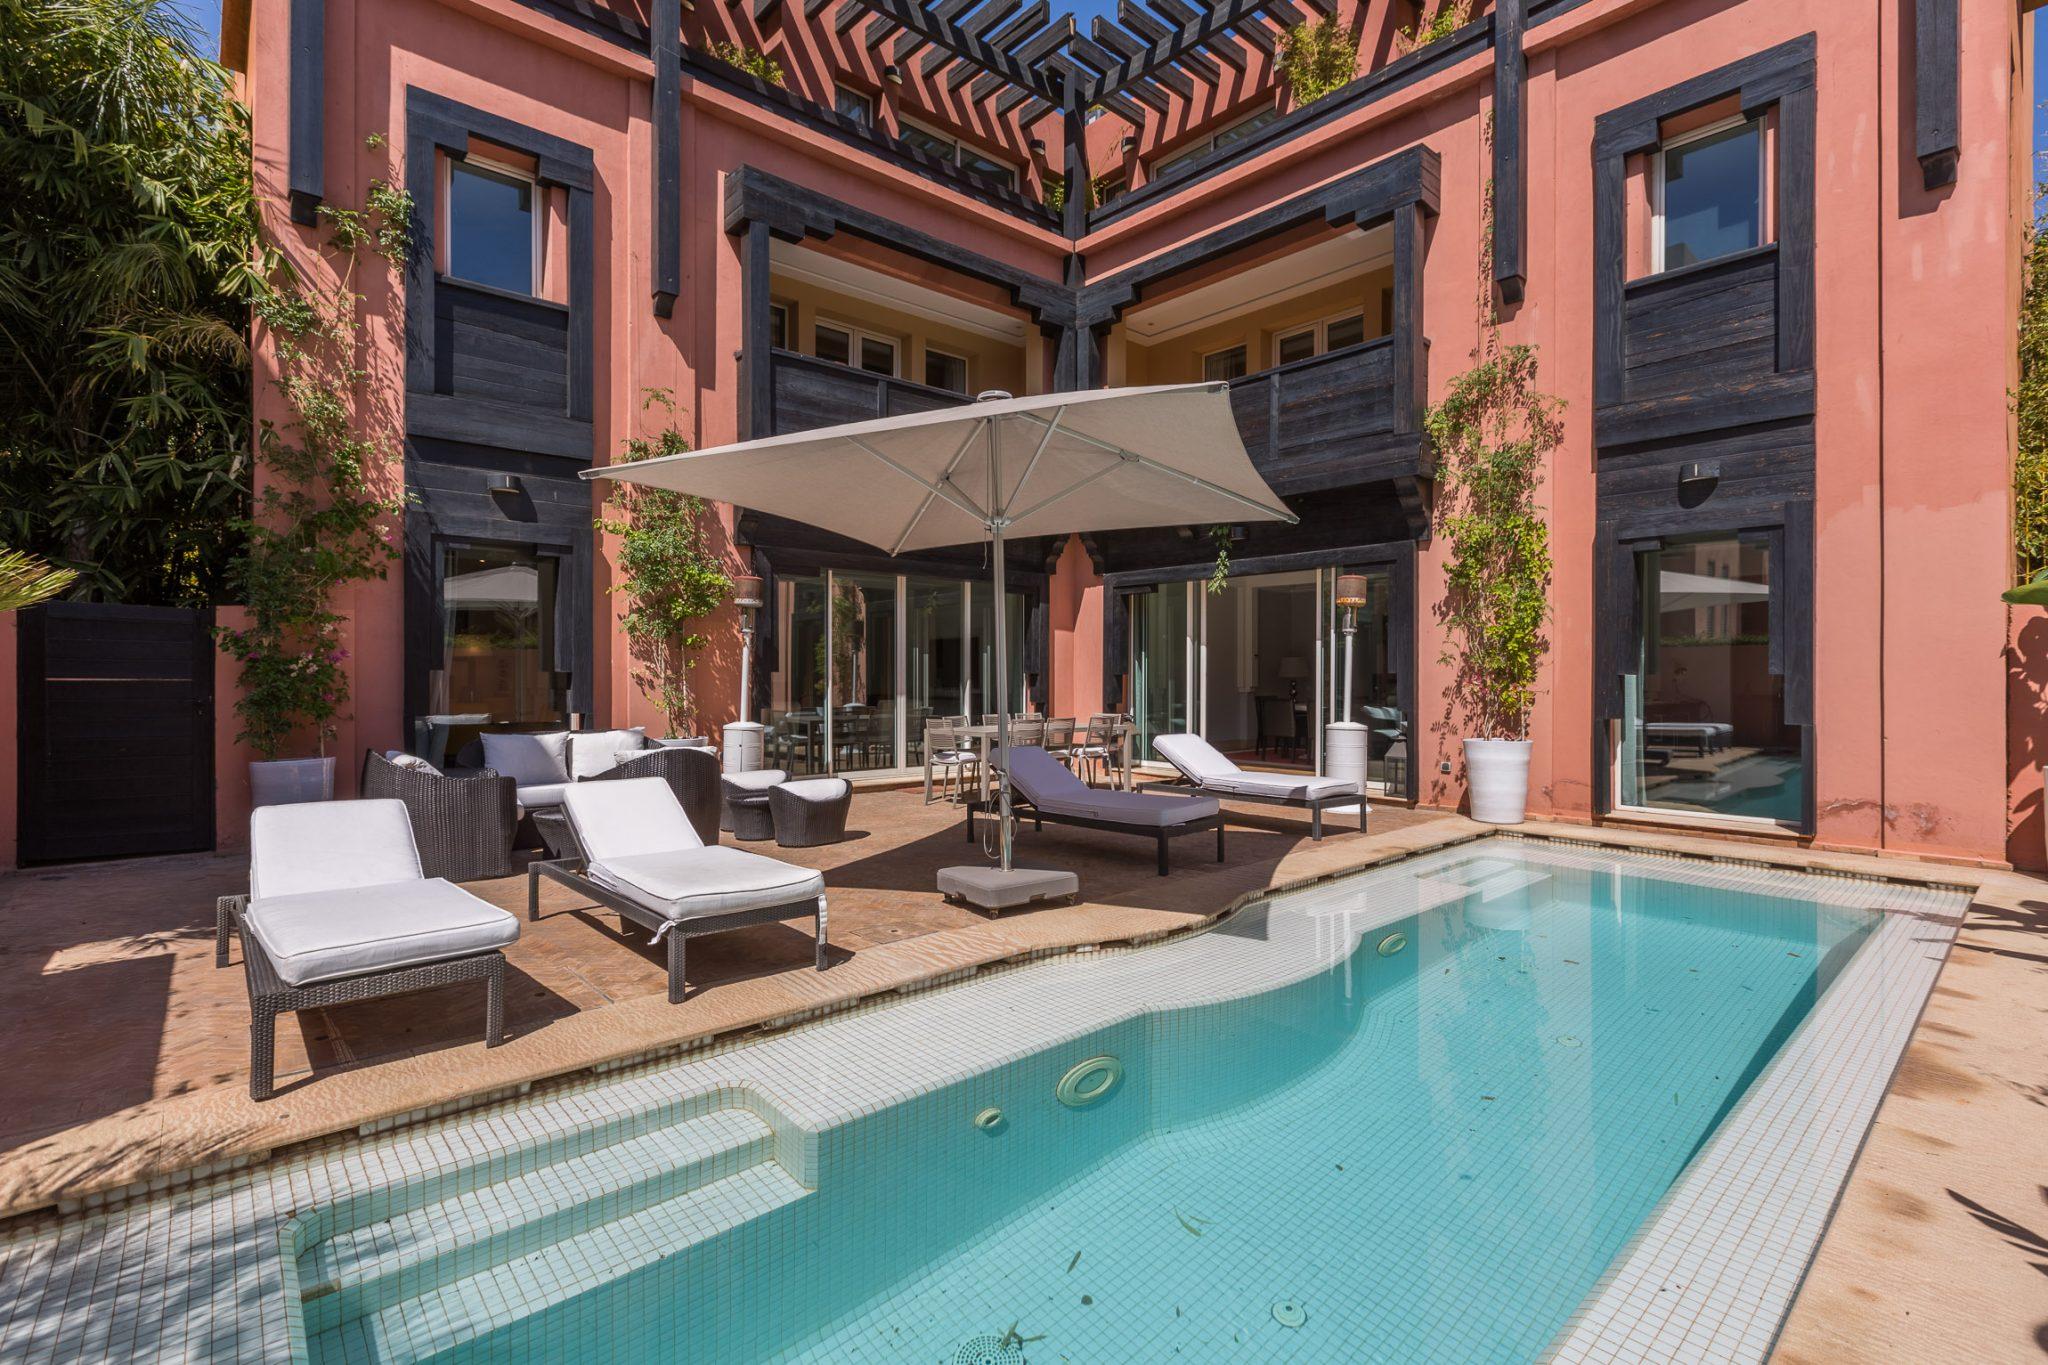 Location villa marrakech magnifique villa riad avec - Location maison avec piscine marrakech ...